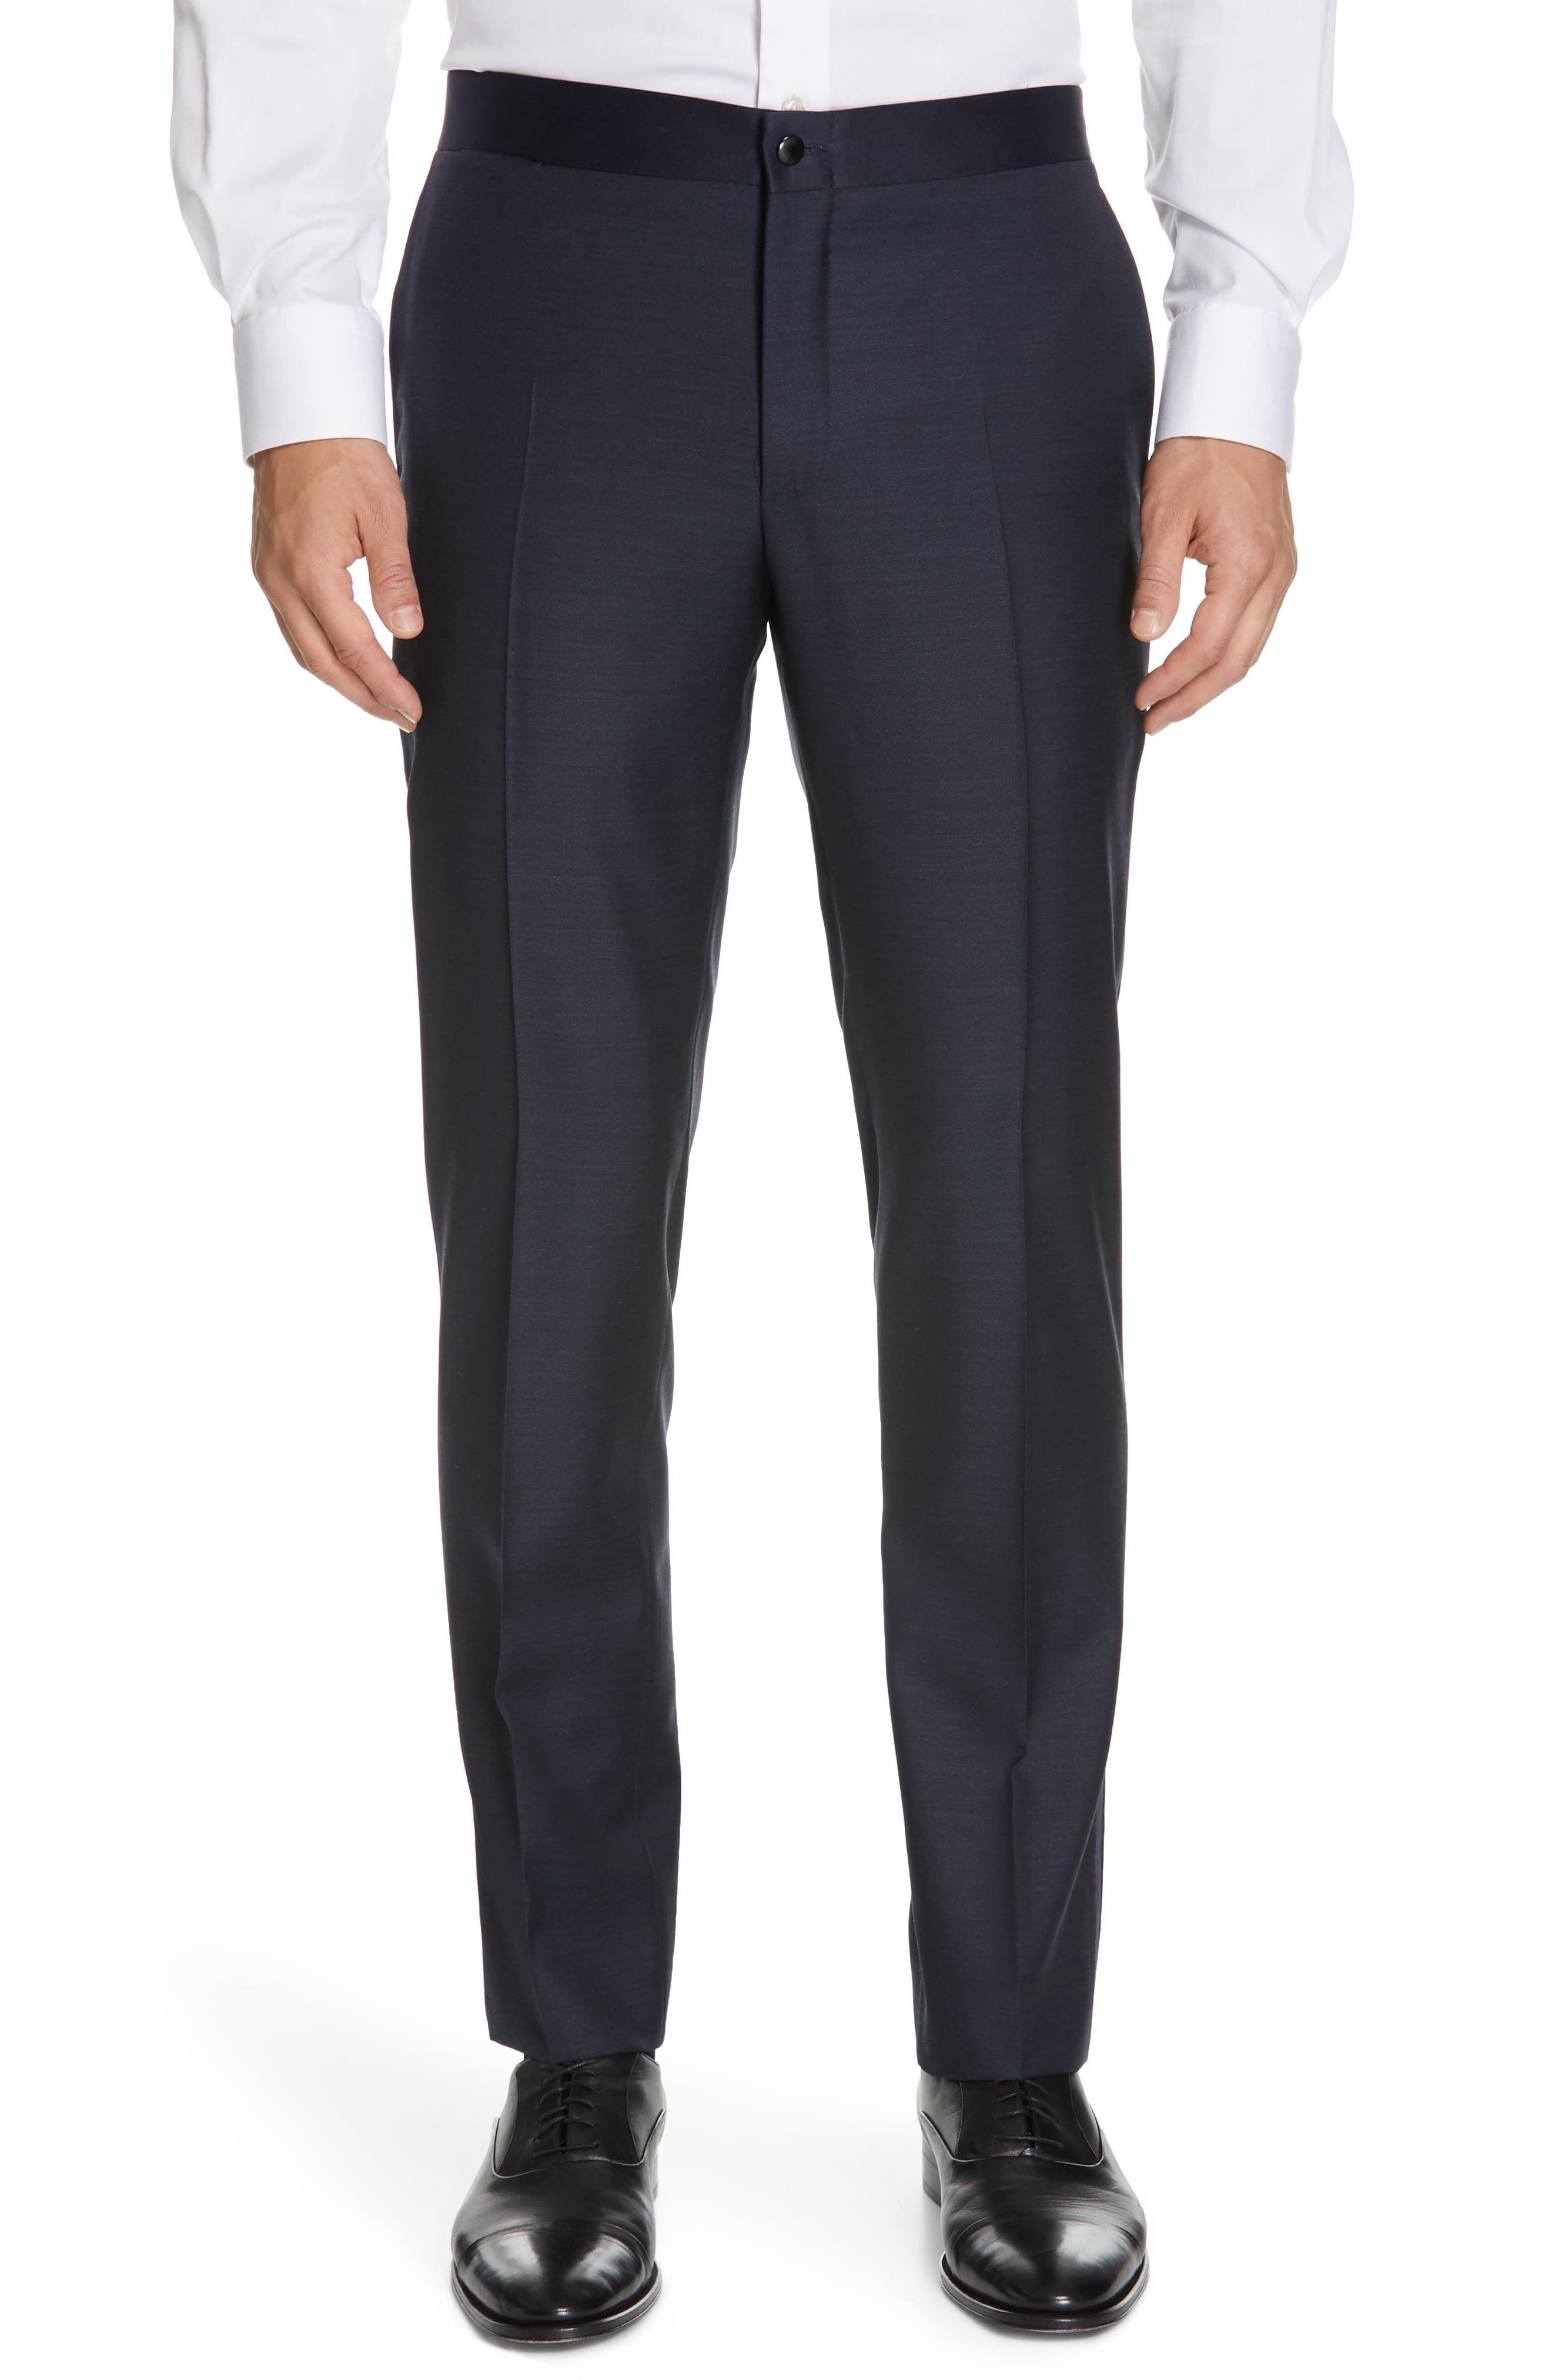 CANALI, Venieza Classic Fit Wool Tuxedo, Alternate thumbnail 6, color, NAVY